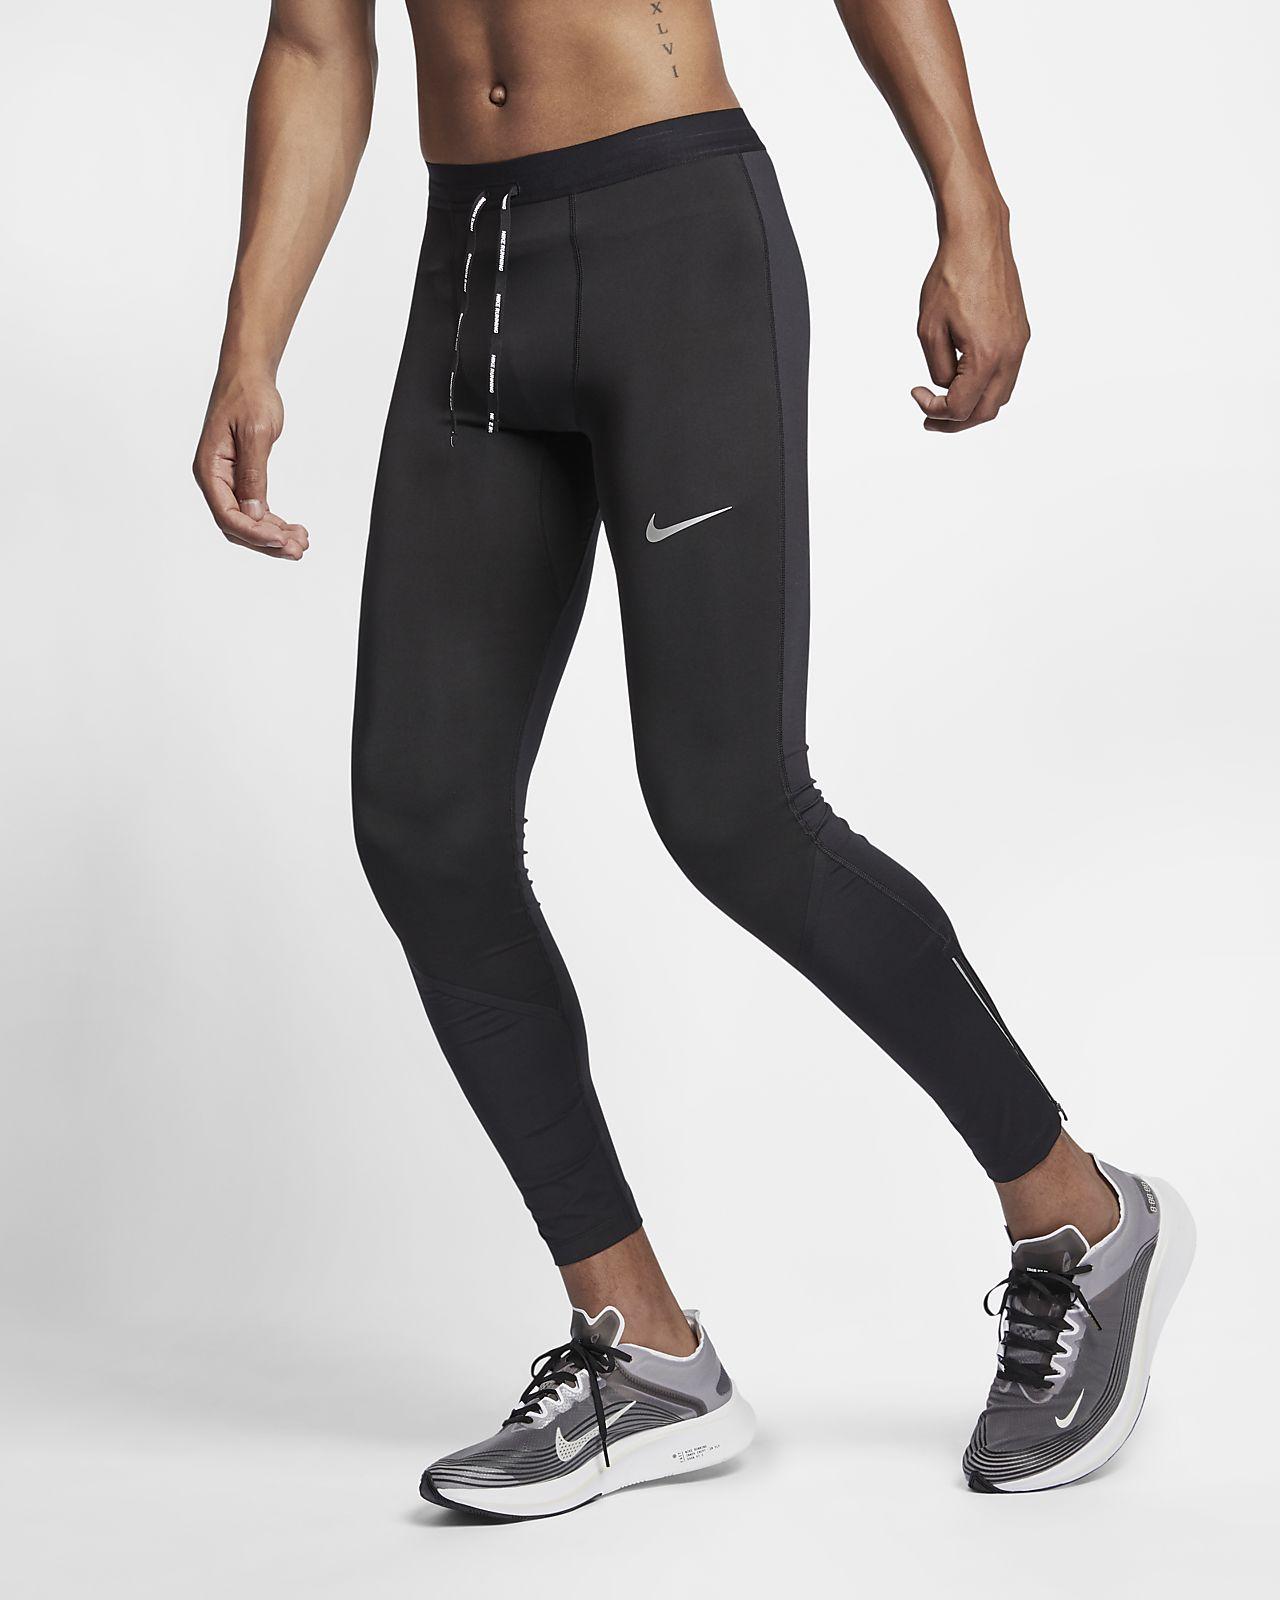 Nike Power Tech Mallas de running - Hombre